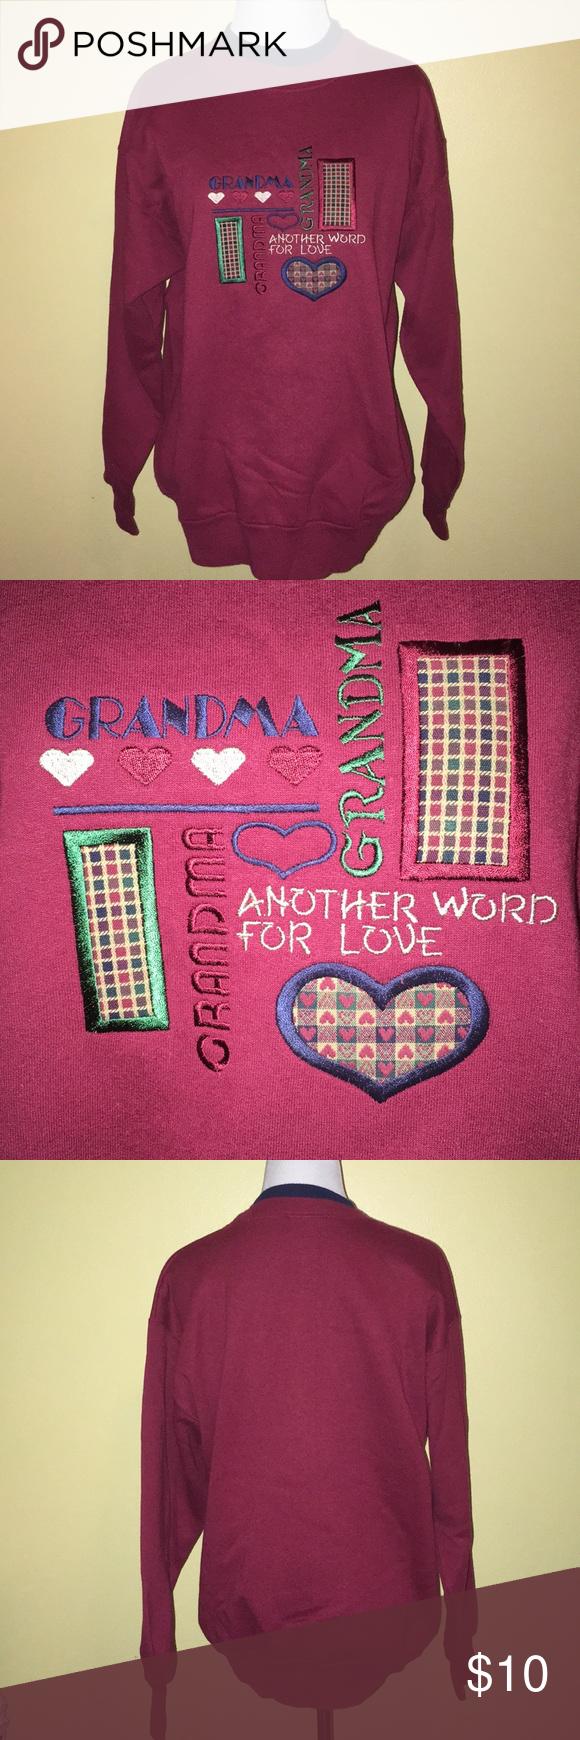 Grandma Another Word For Love Sweatshirt Love Words Sweatshirts Sweatshirts Hoodie